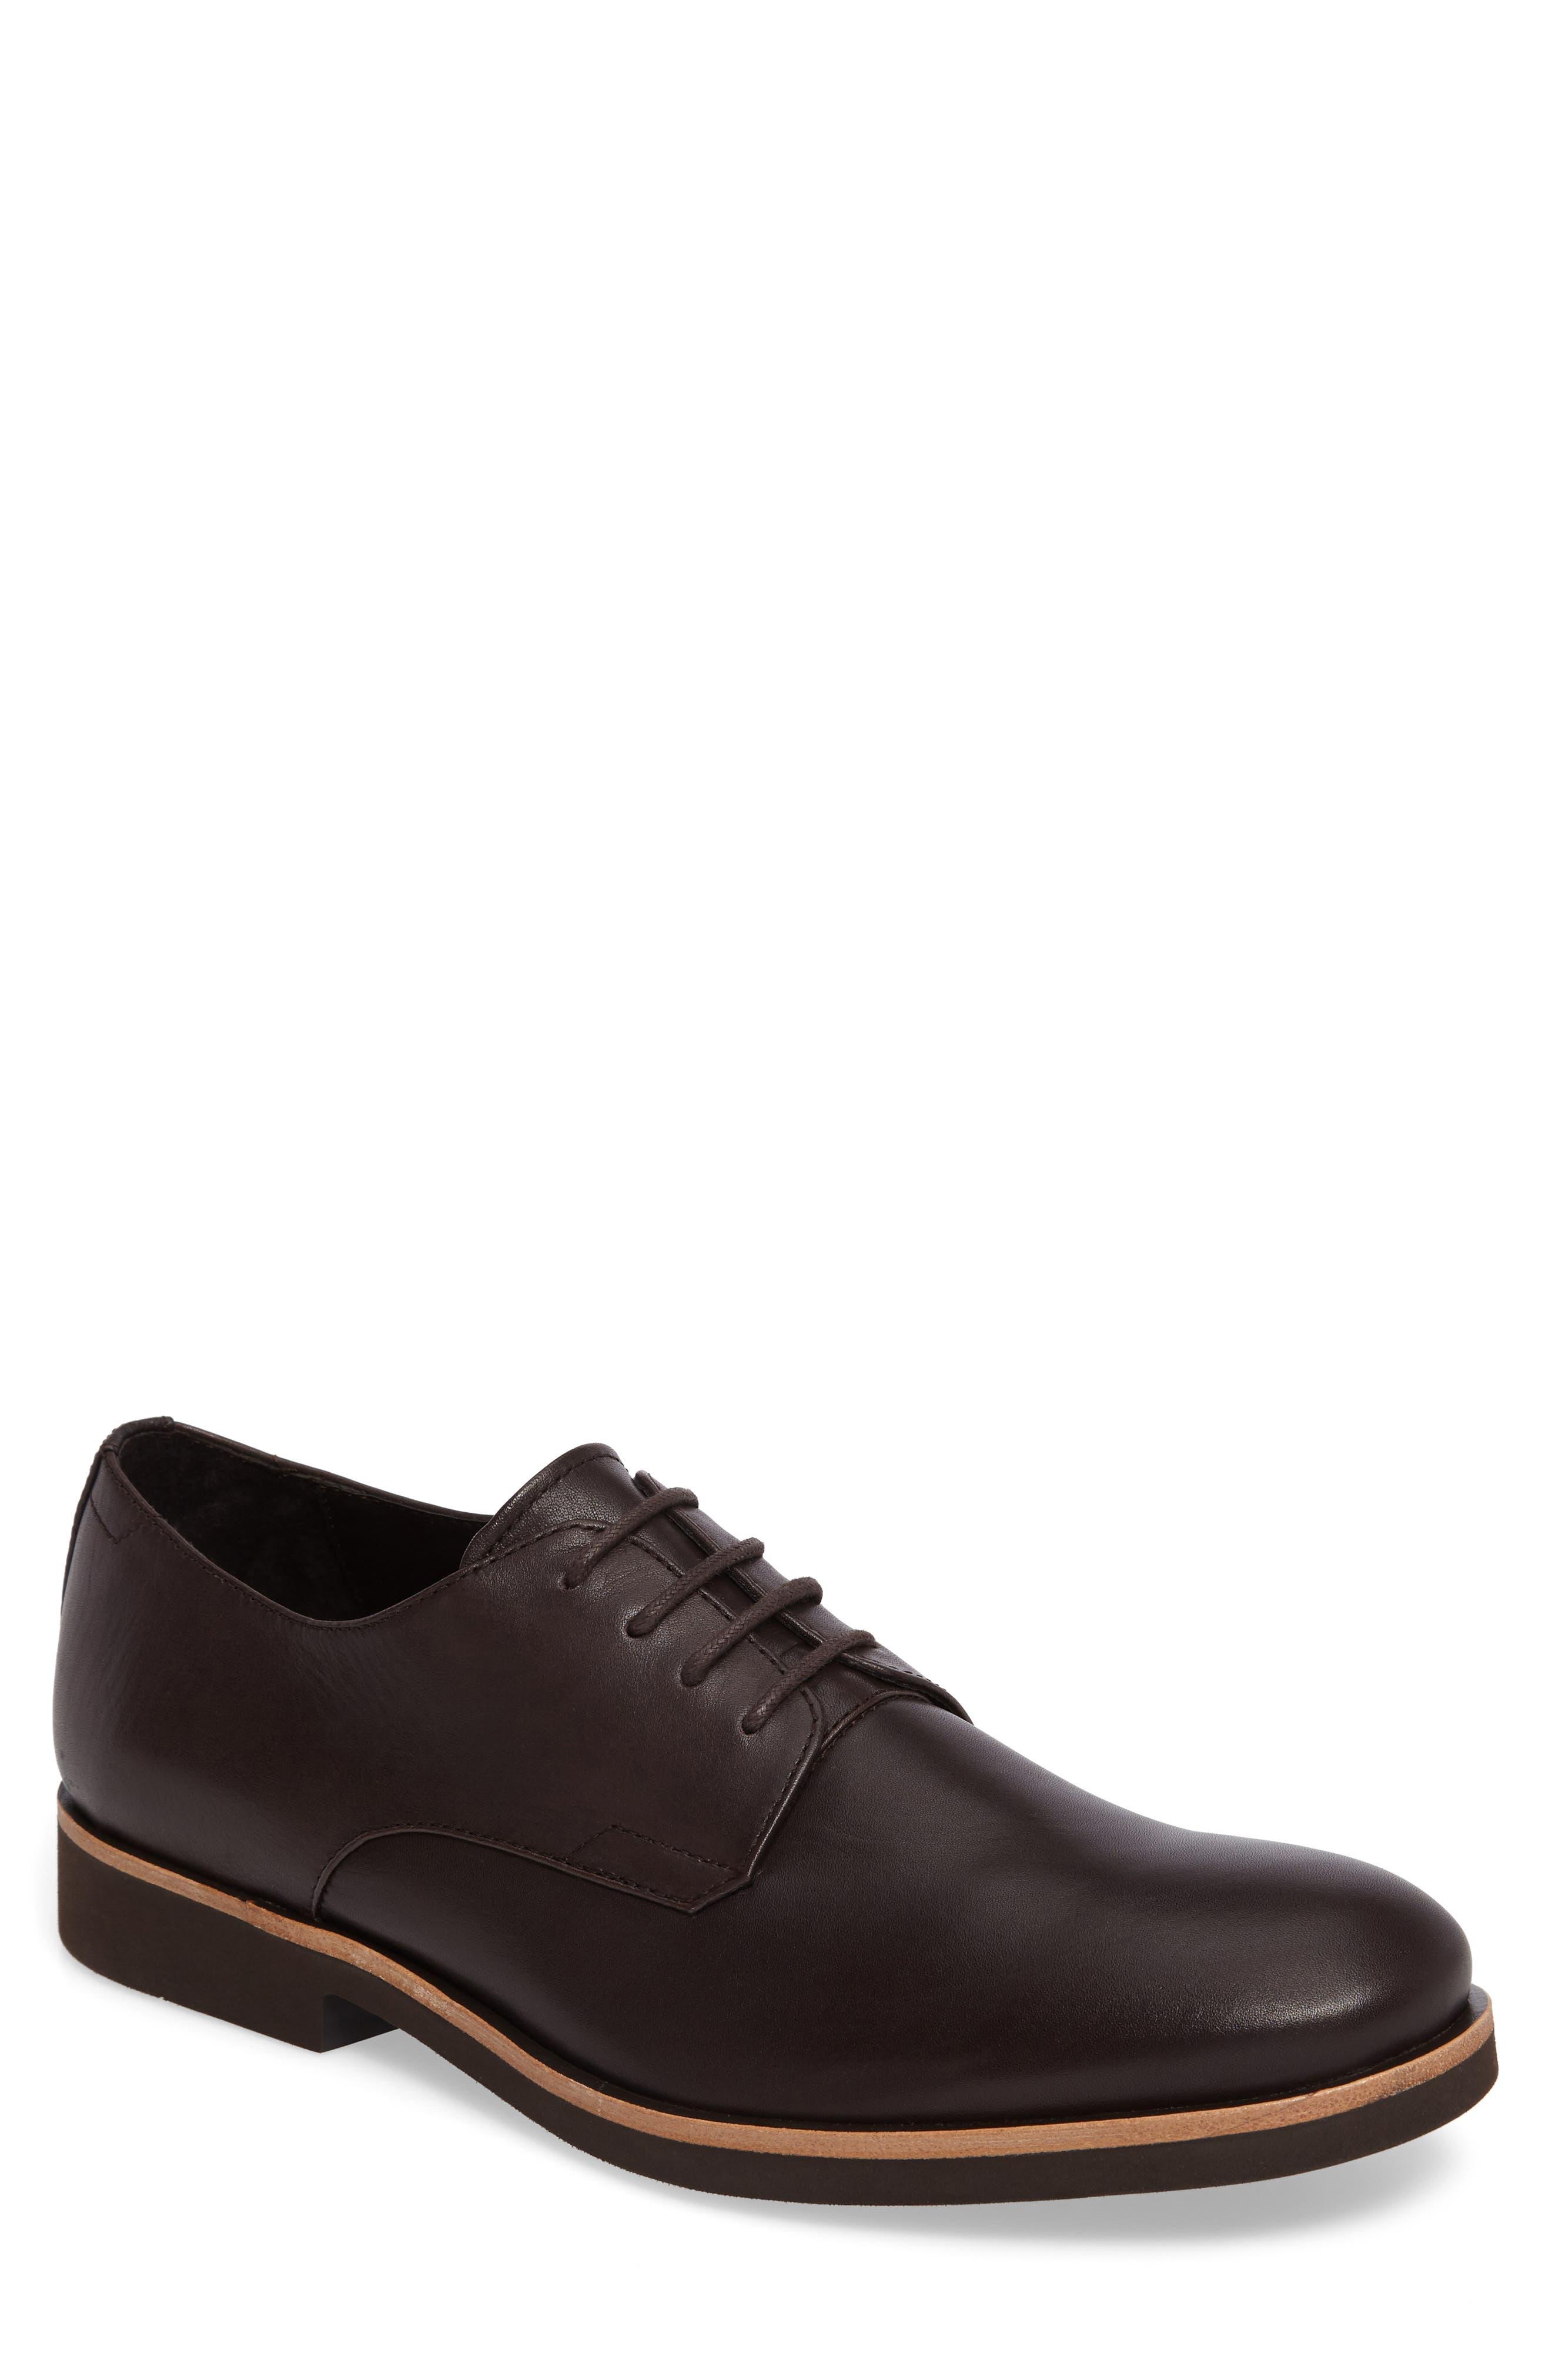 Plain Toe Derby,                         Main,                         color, Dark Brown